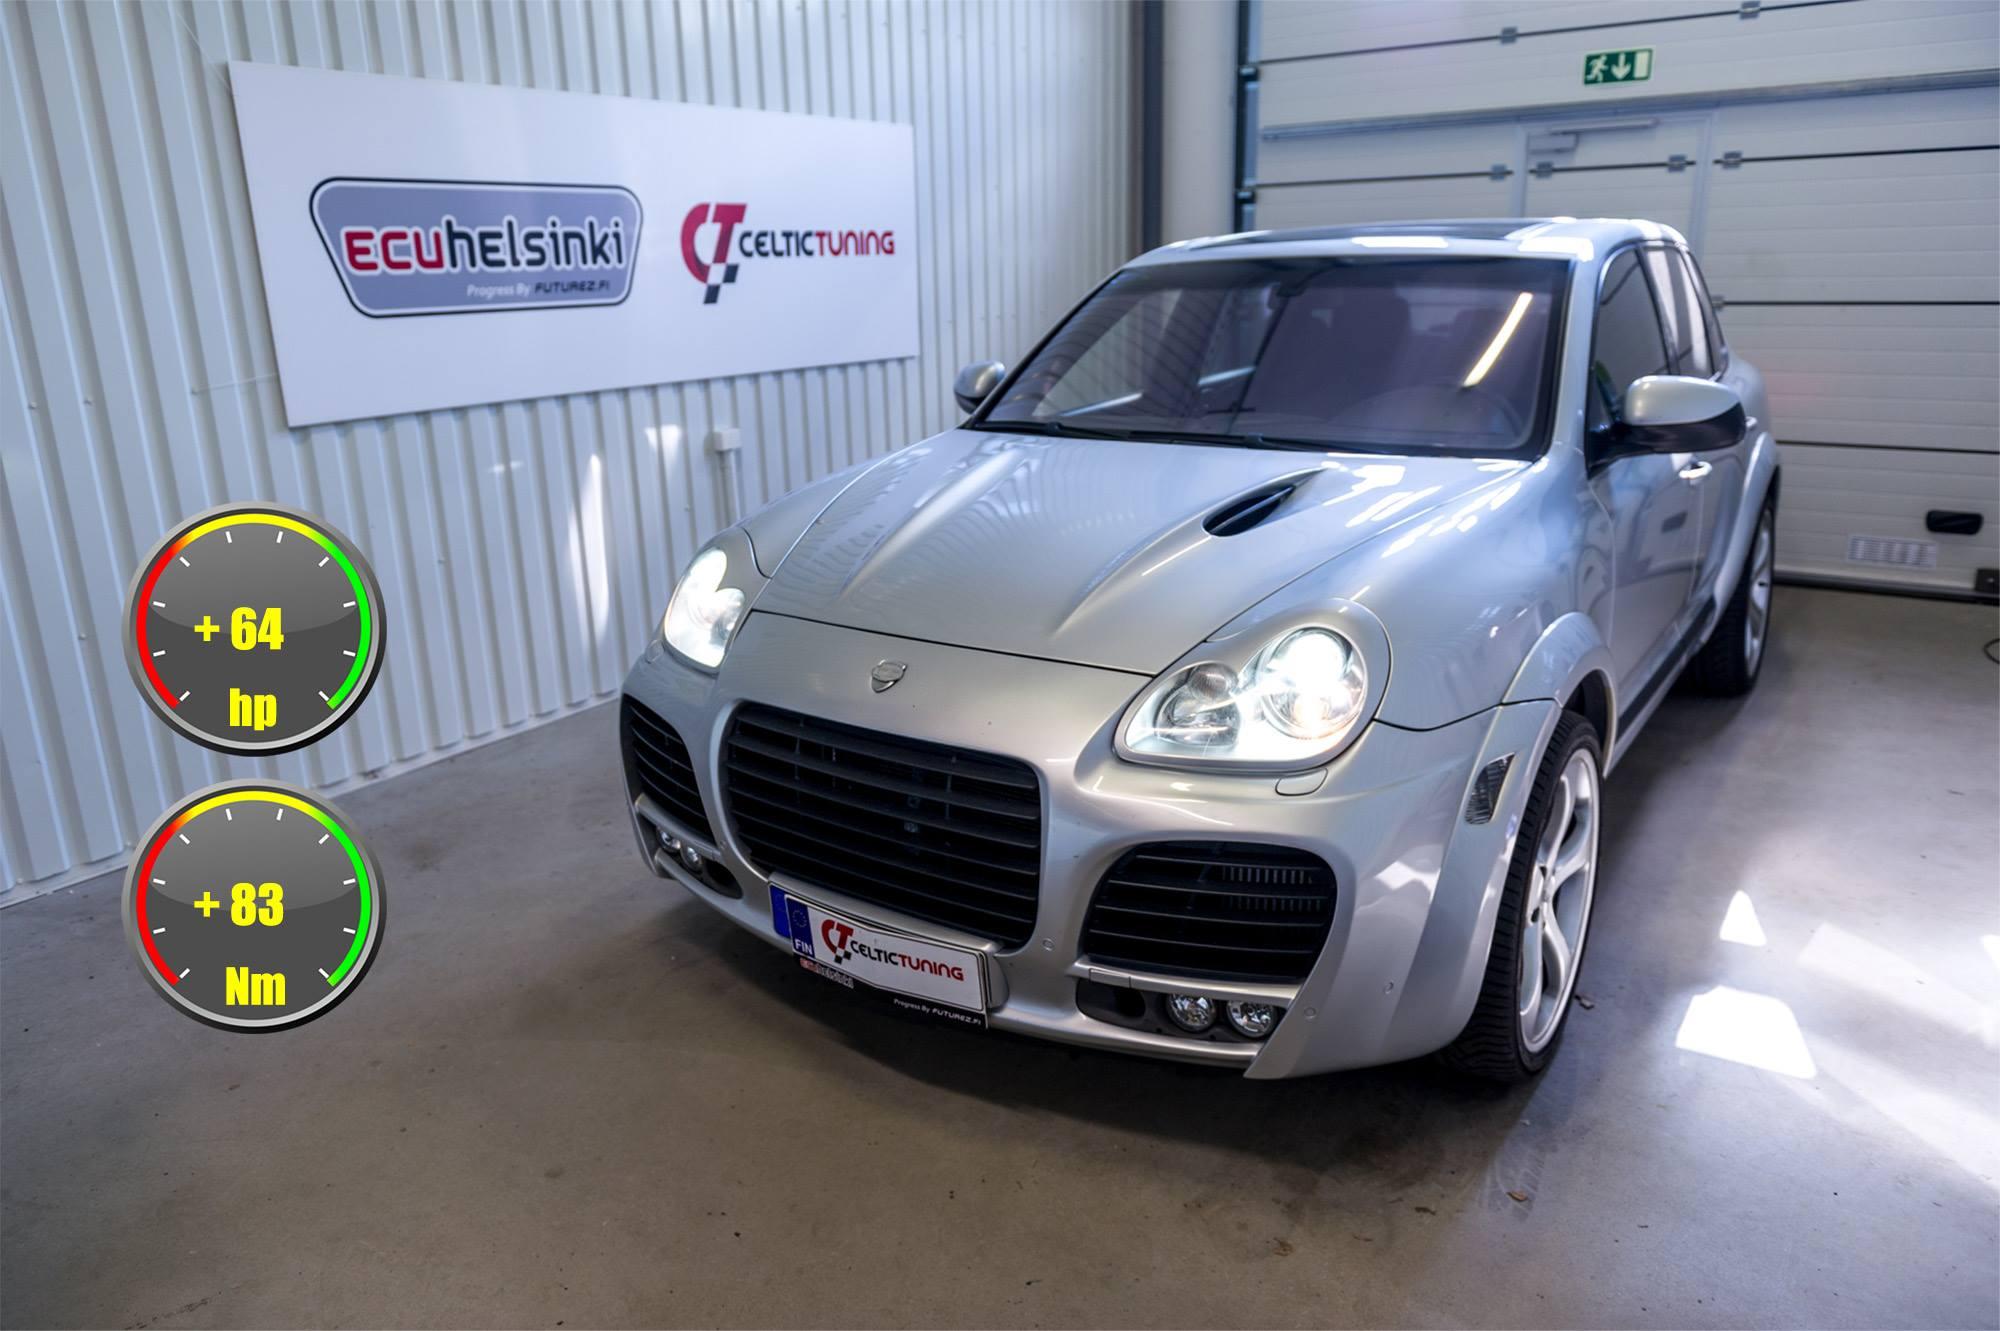 Porsche Cayenne Turbo Lastutus celti